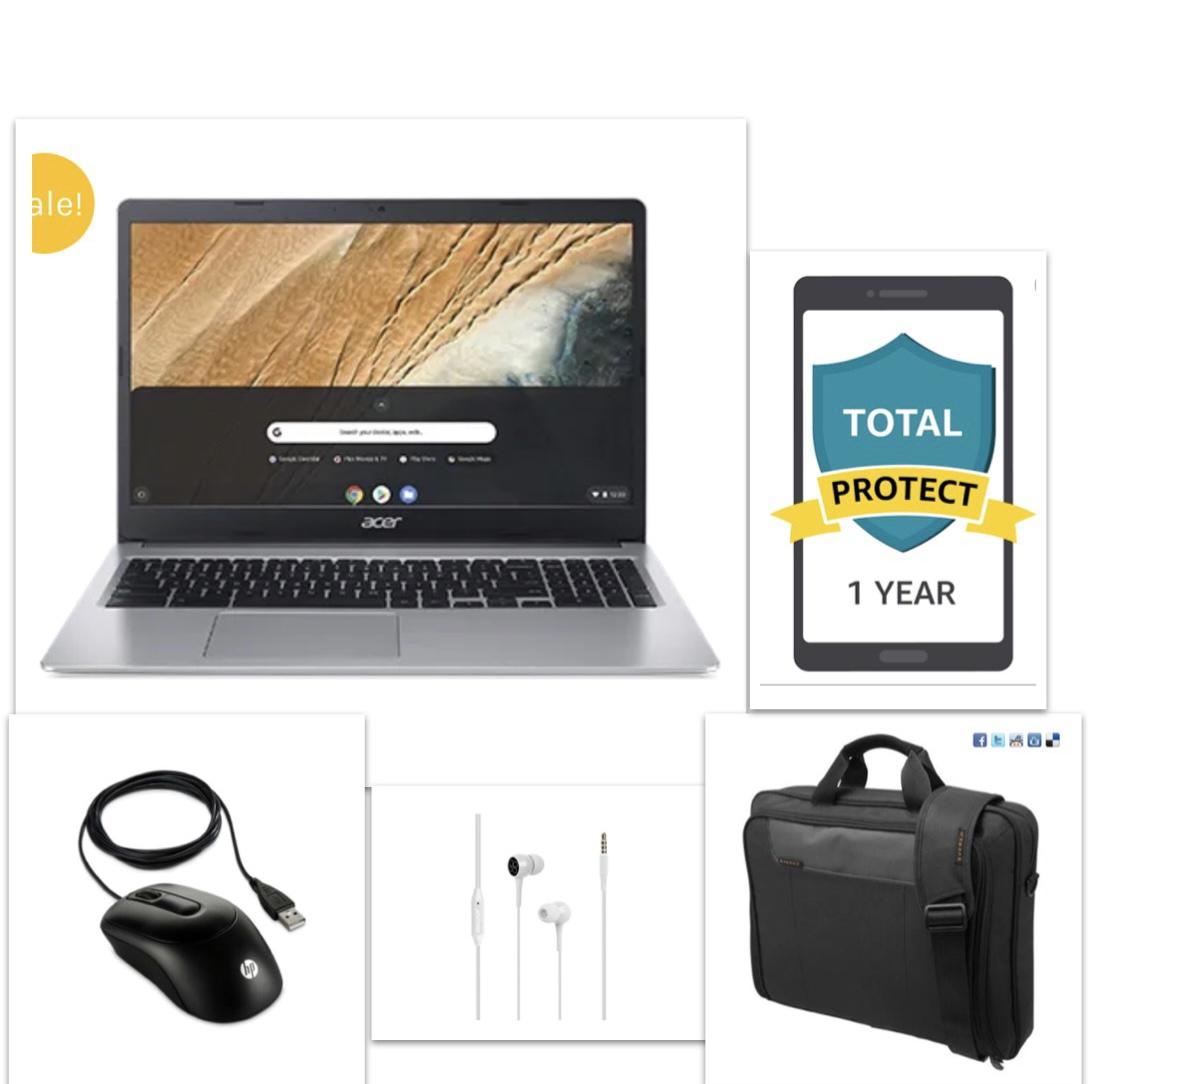 New Acer 15.6 Chromebook Bundle – Chromebook+Bag+Ear Phone+Mouse+12 Month Damage Protection